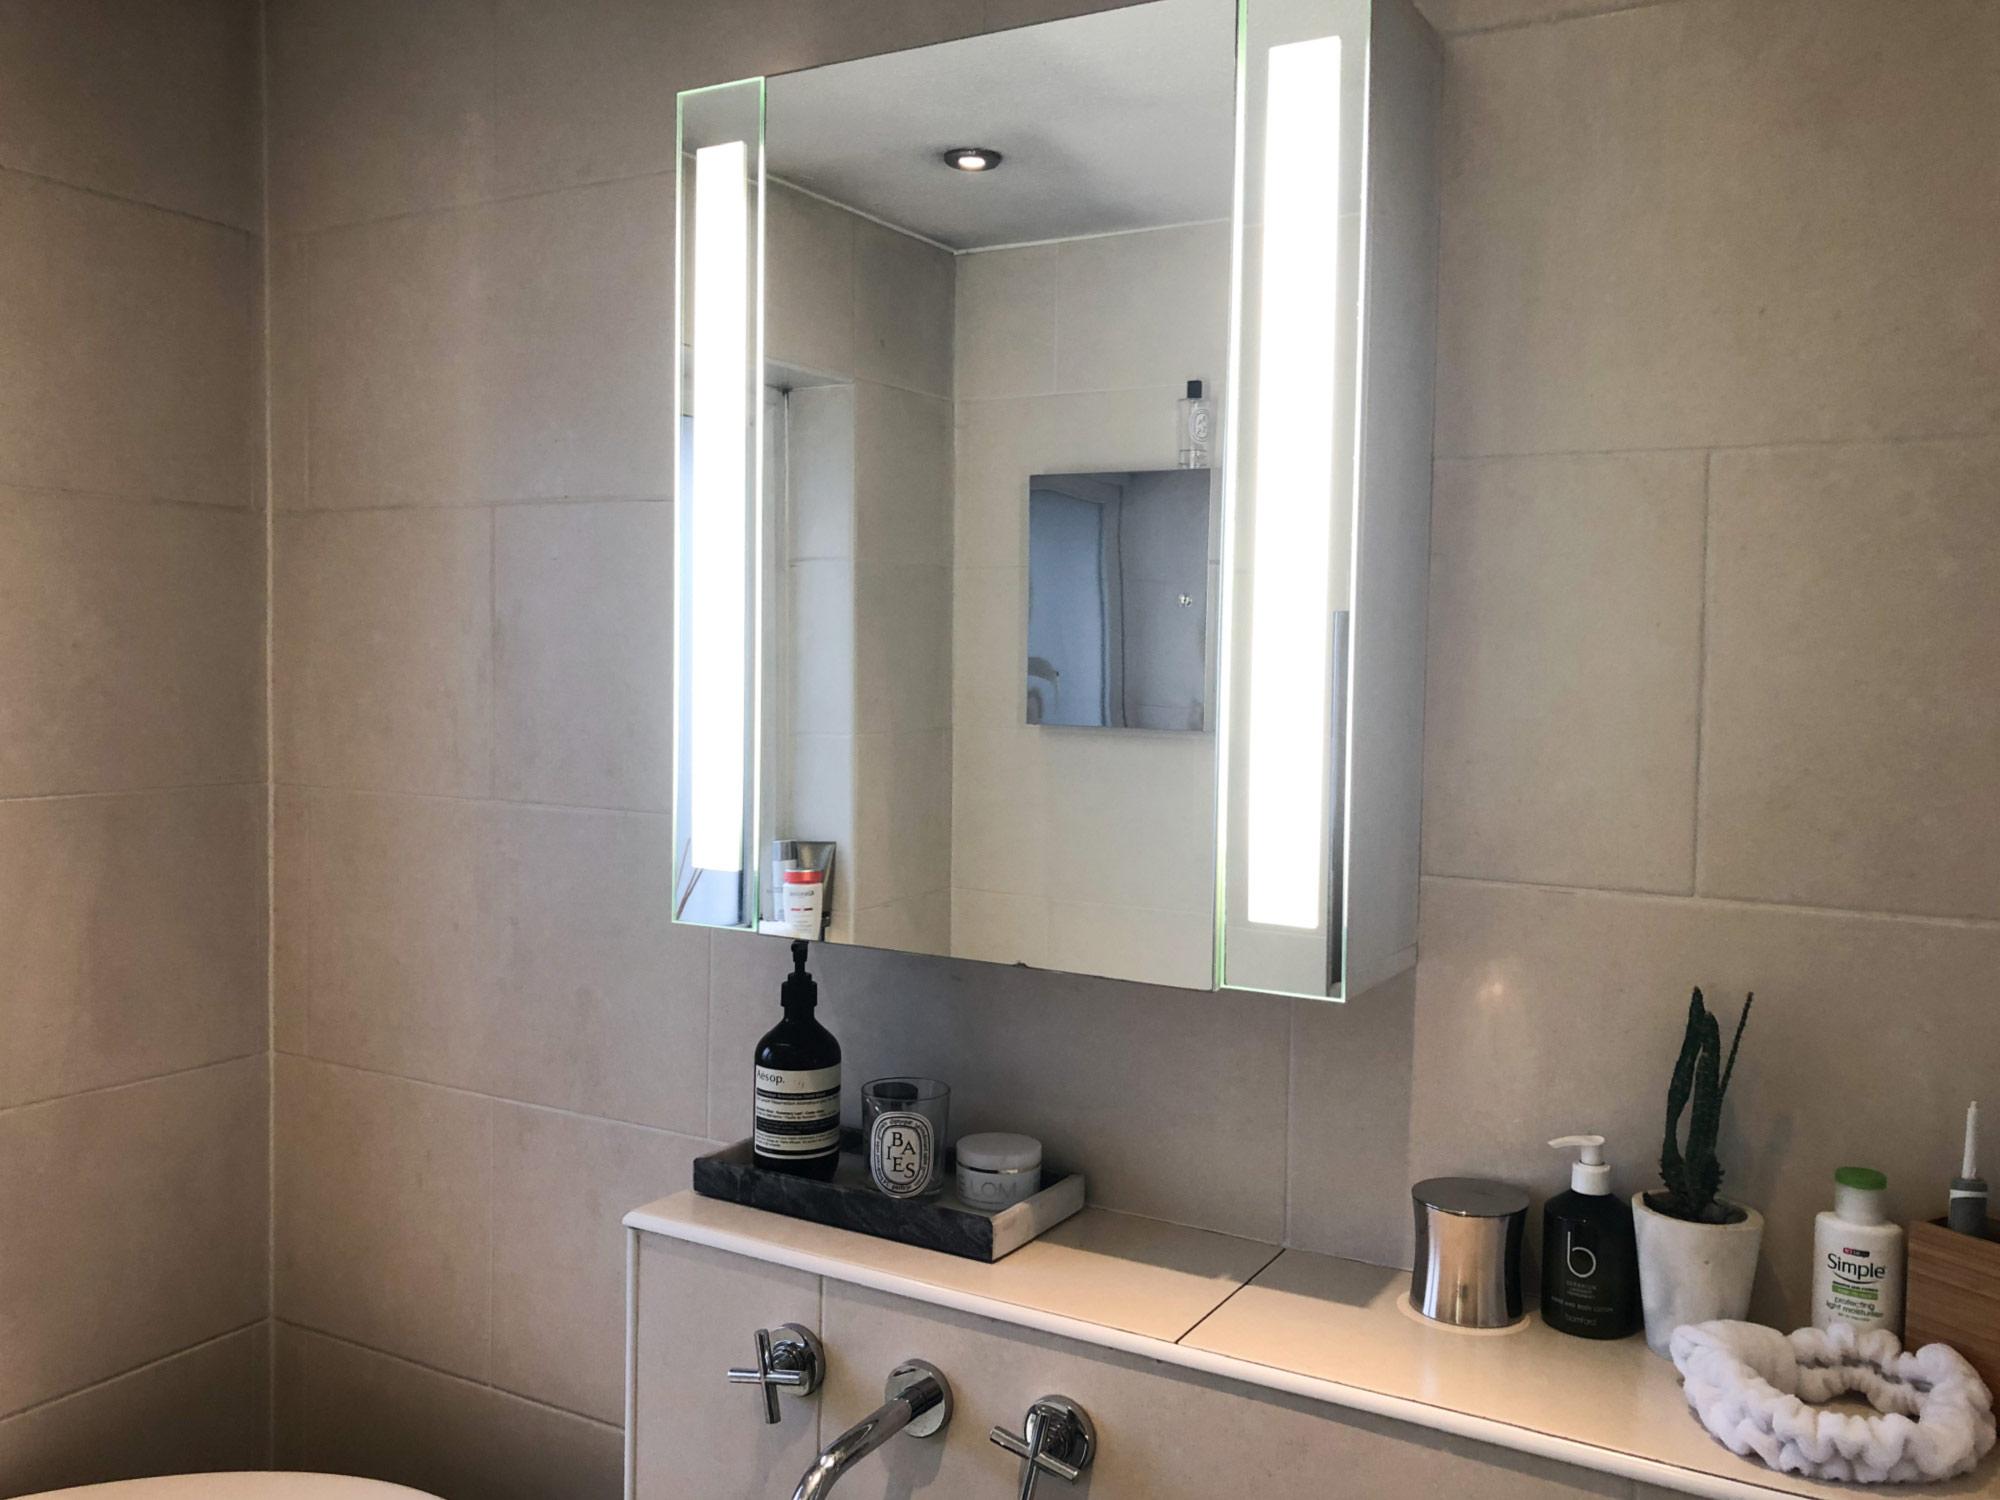 2 side-lit-mirror-bathroom-cabinet.jpg